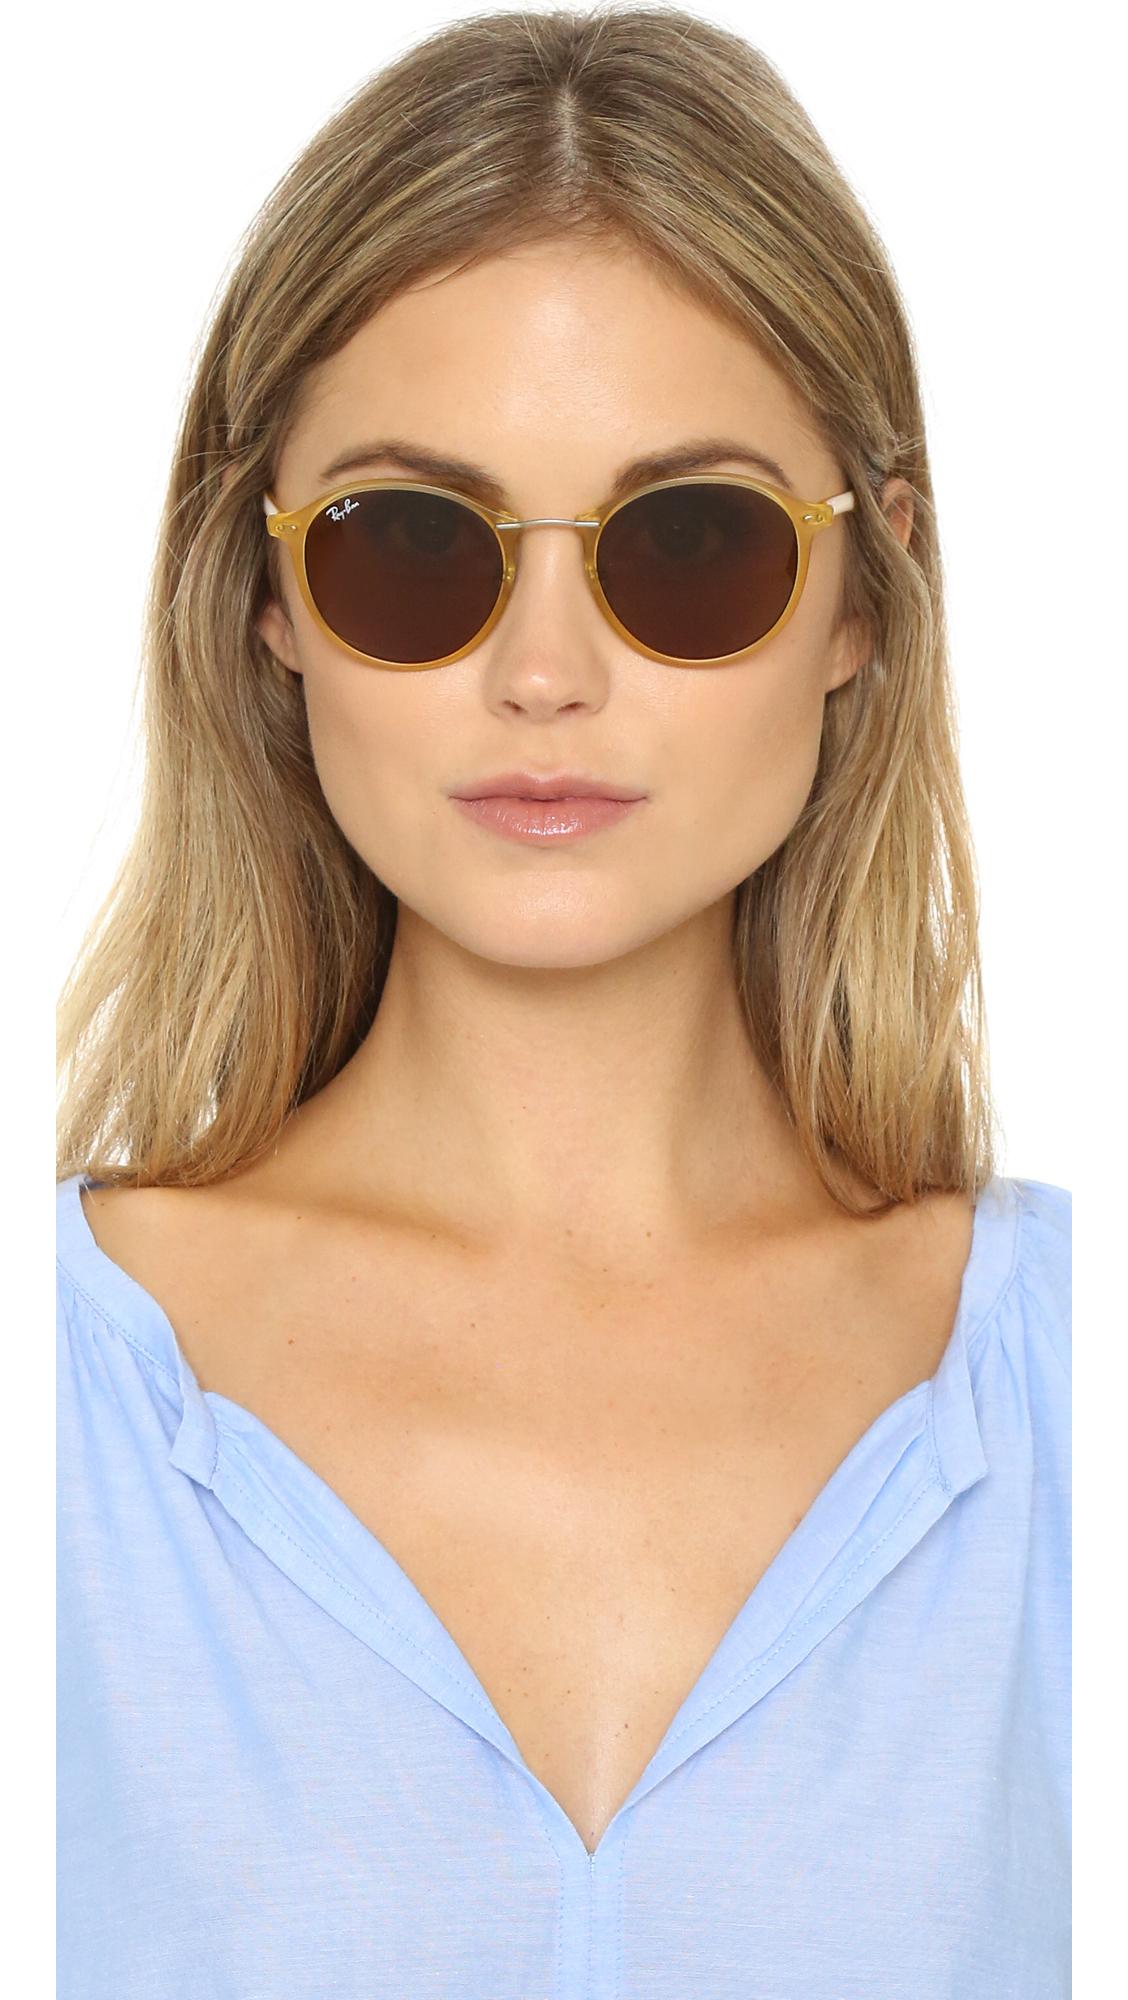 ed2ae5cfba6 ... norway ray ban tech light ray round sunglasses lyst f4ddd 184ed